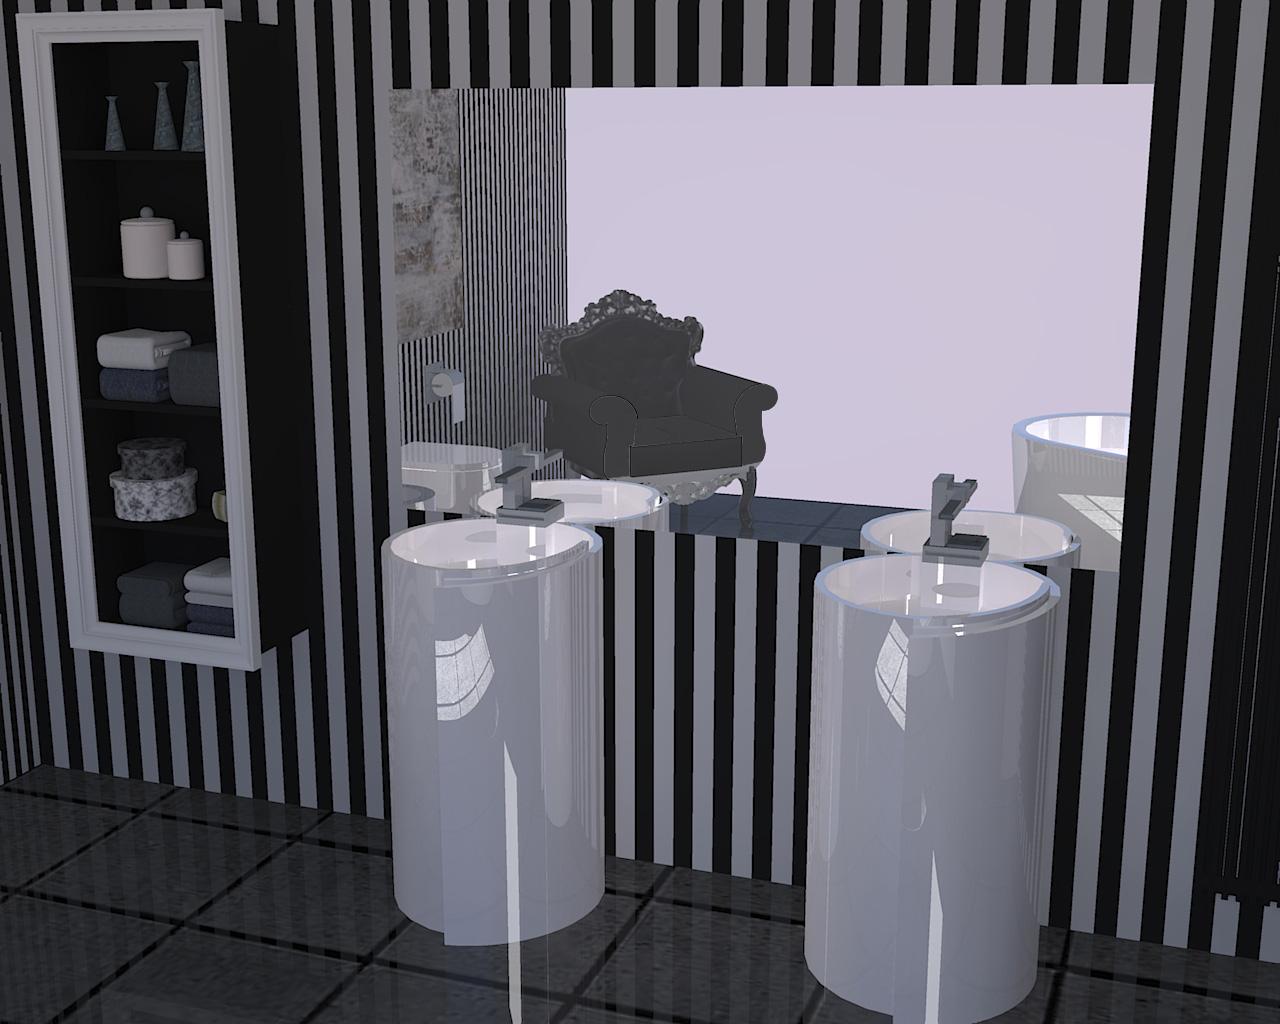 Bagno moderno - Bagno moderno grigio ...